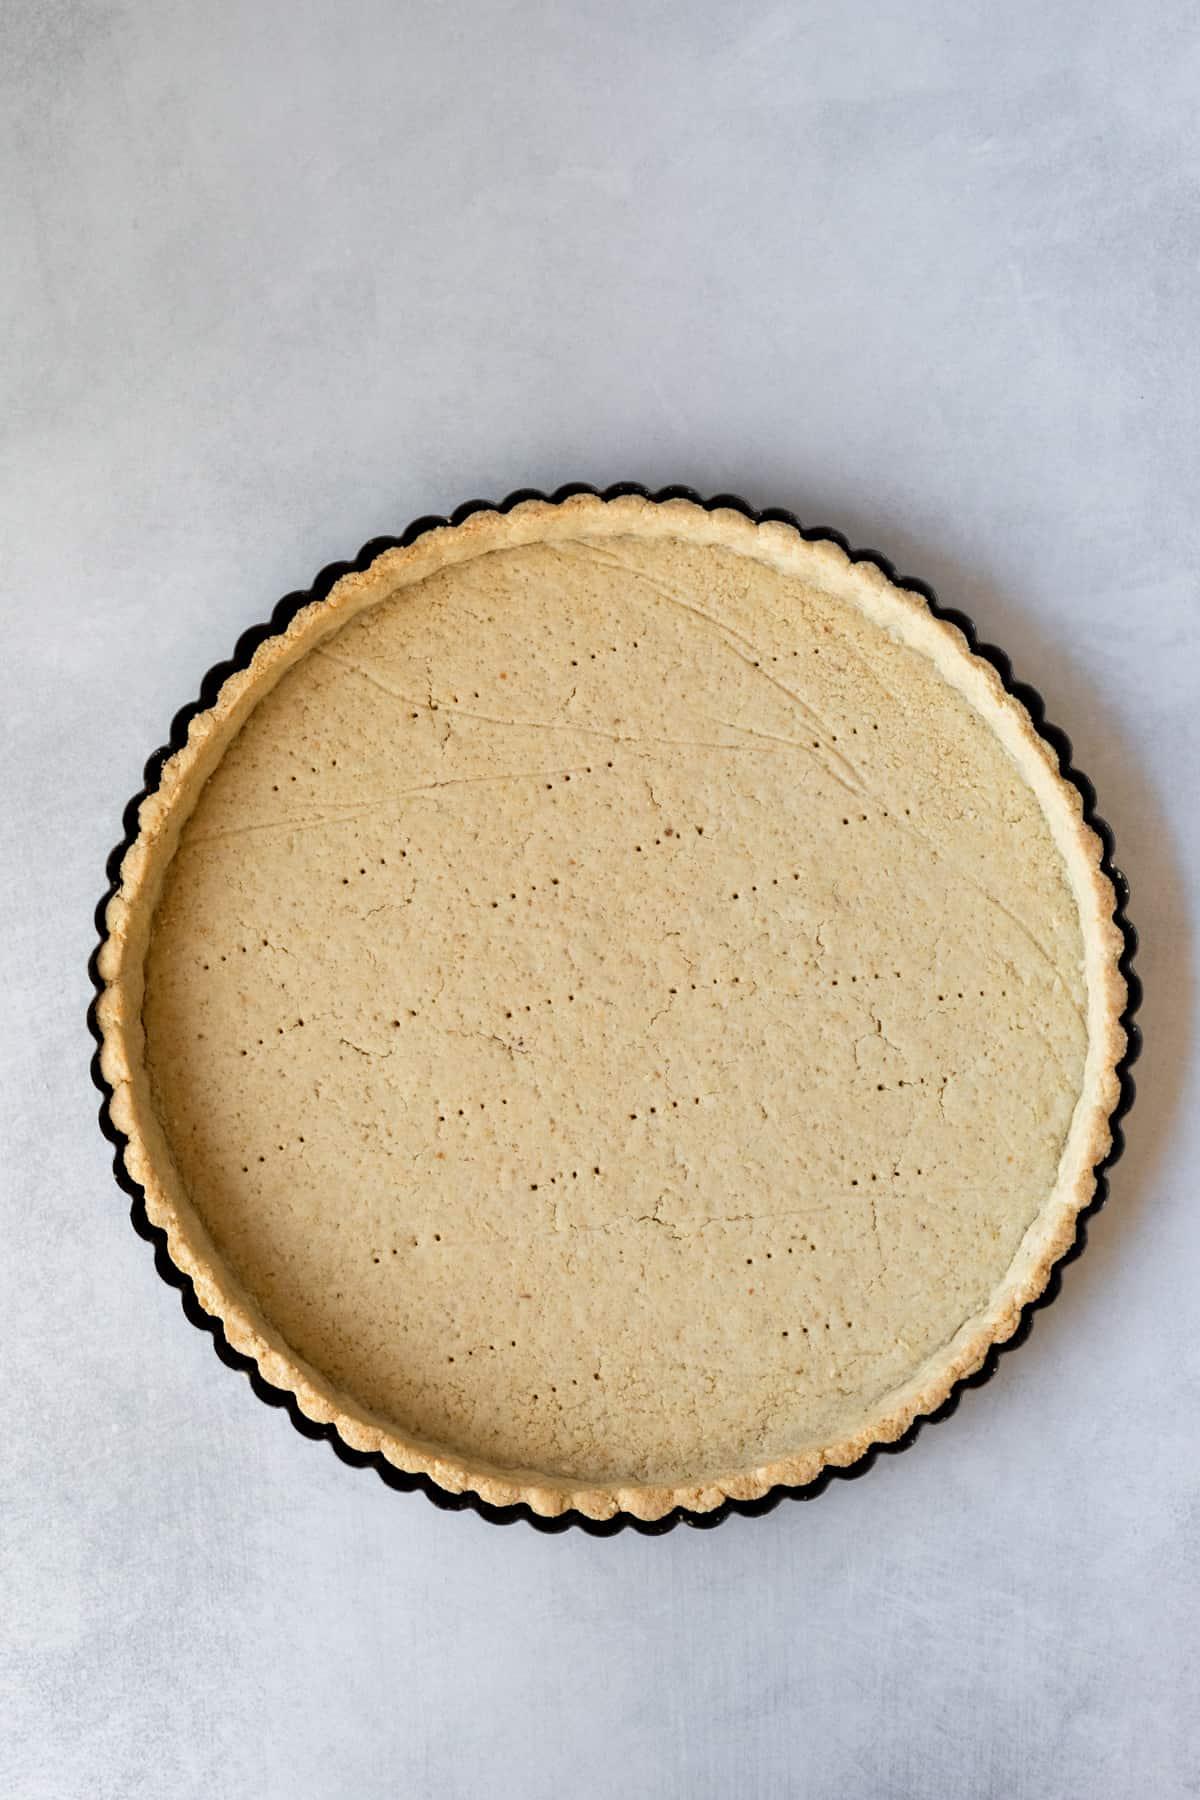 baked crust in a tart pan